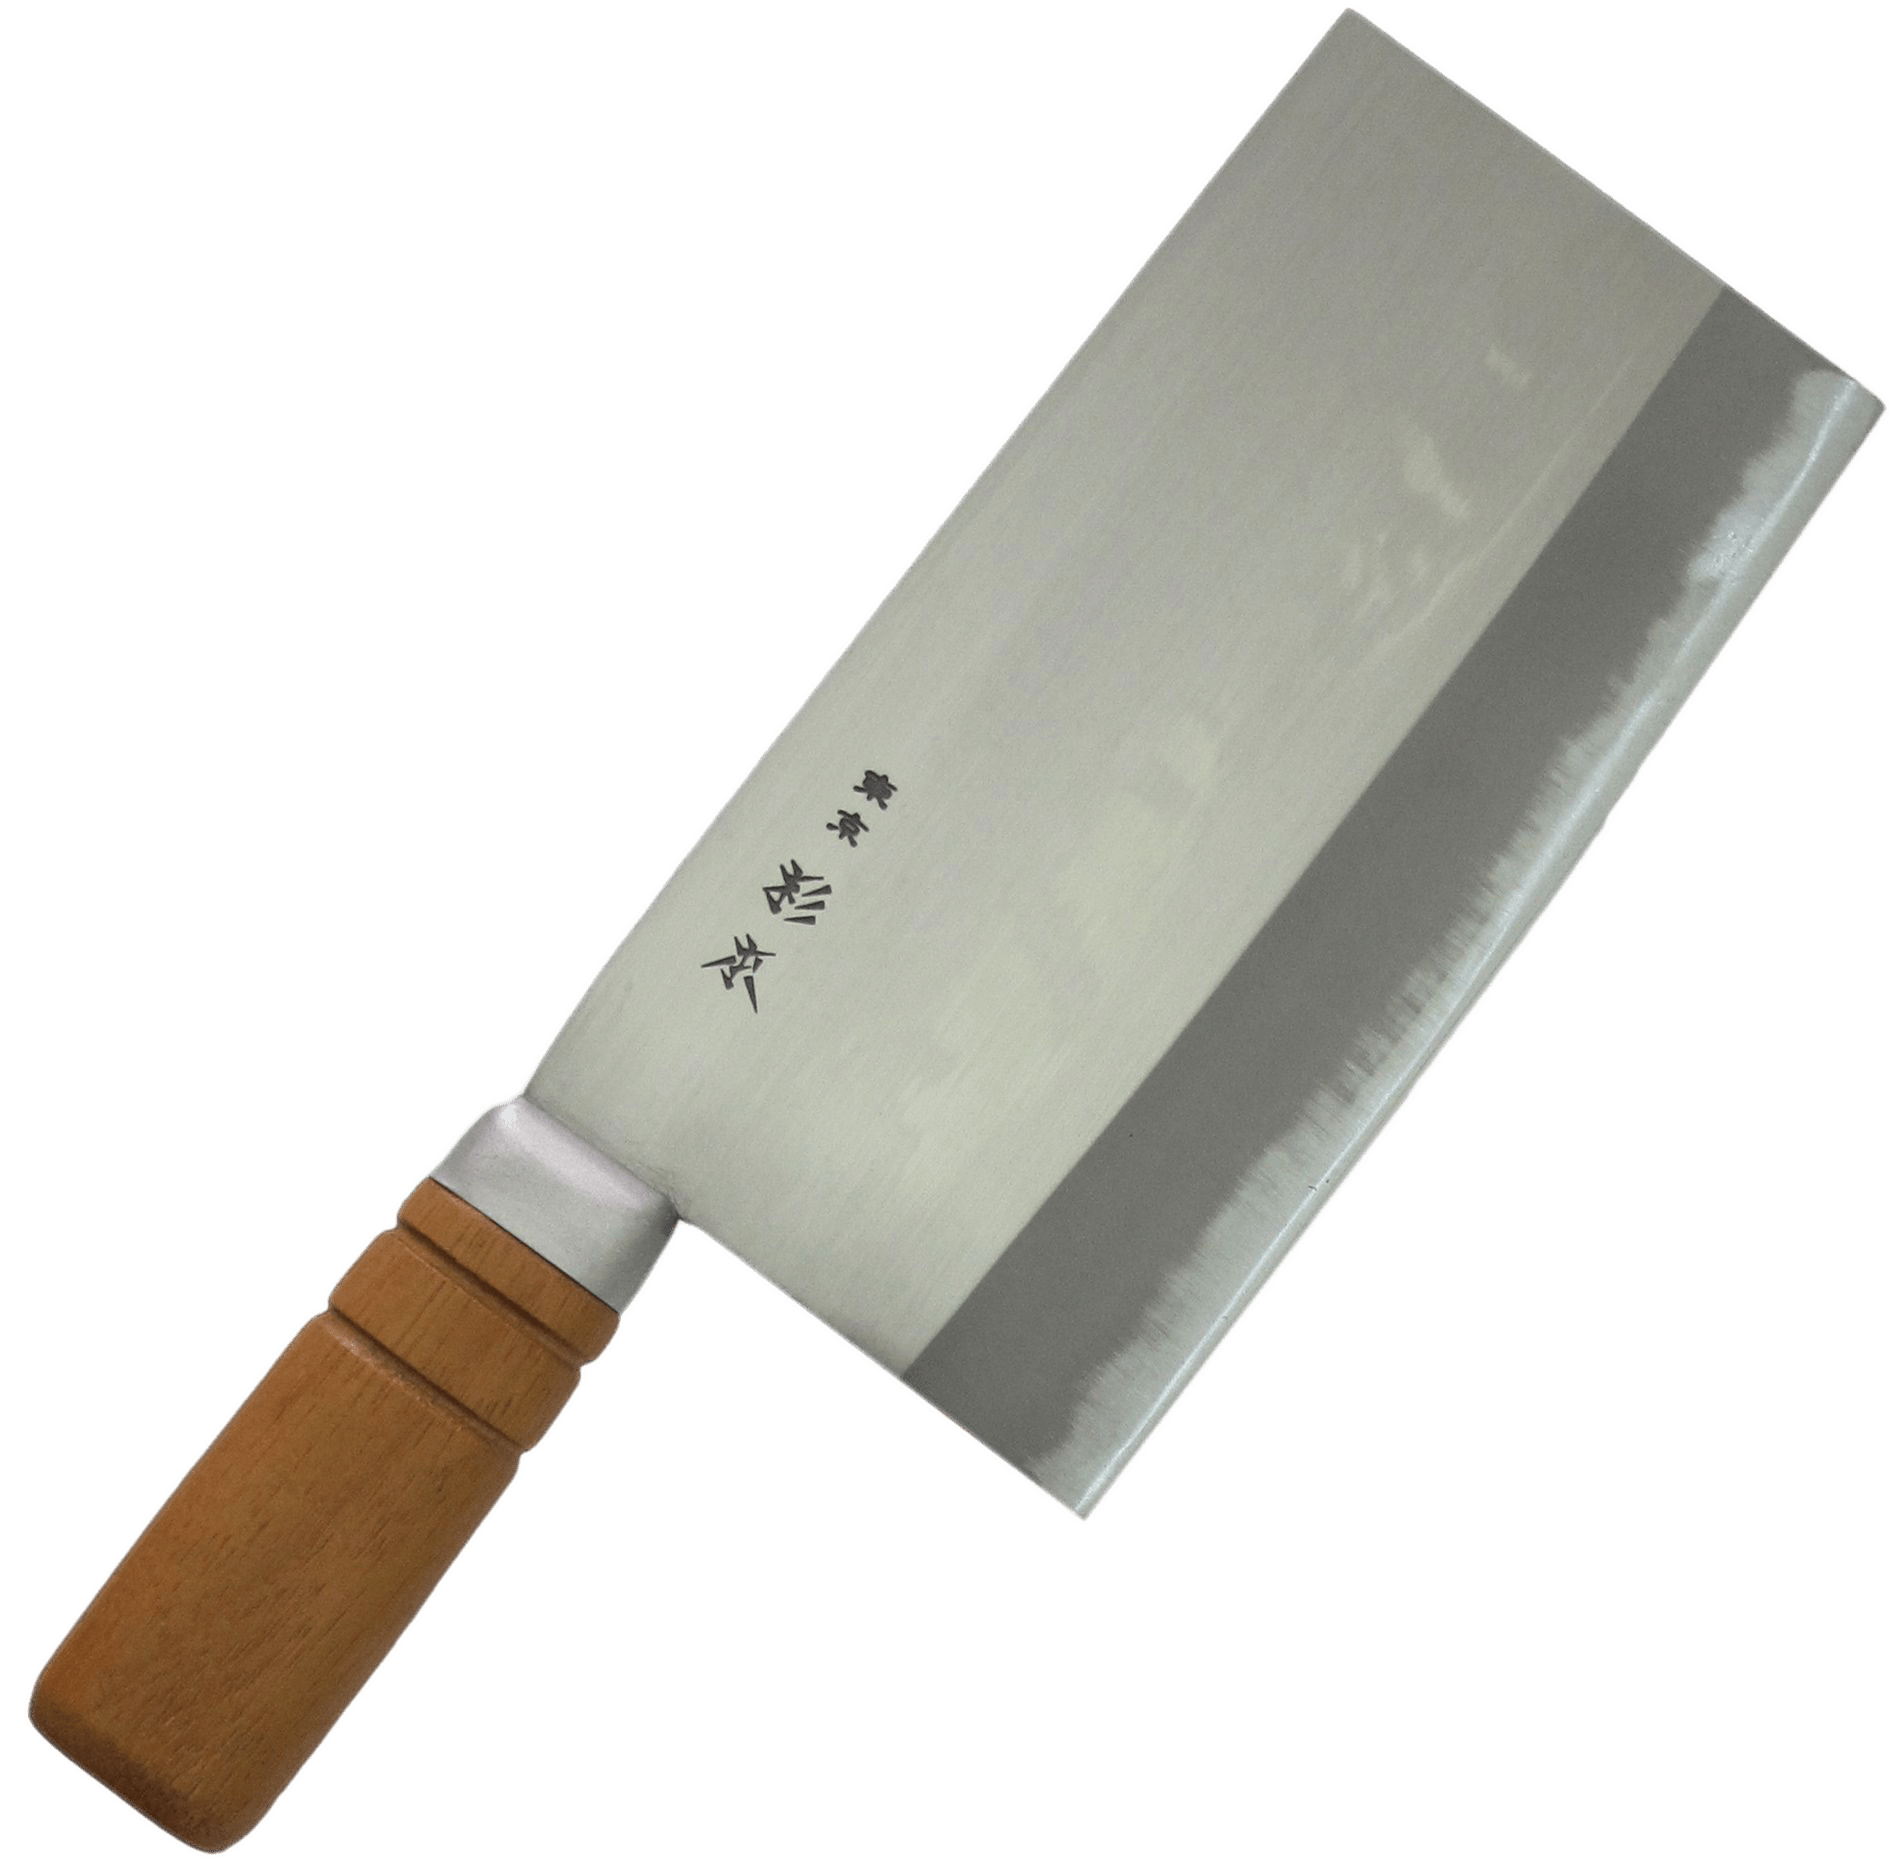 Knife clipart knive. Cuisinart bread transparent png